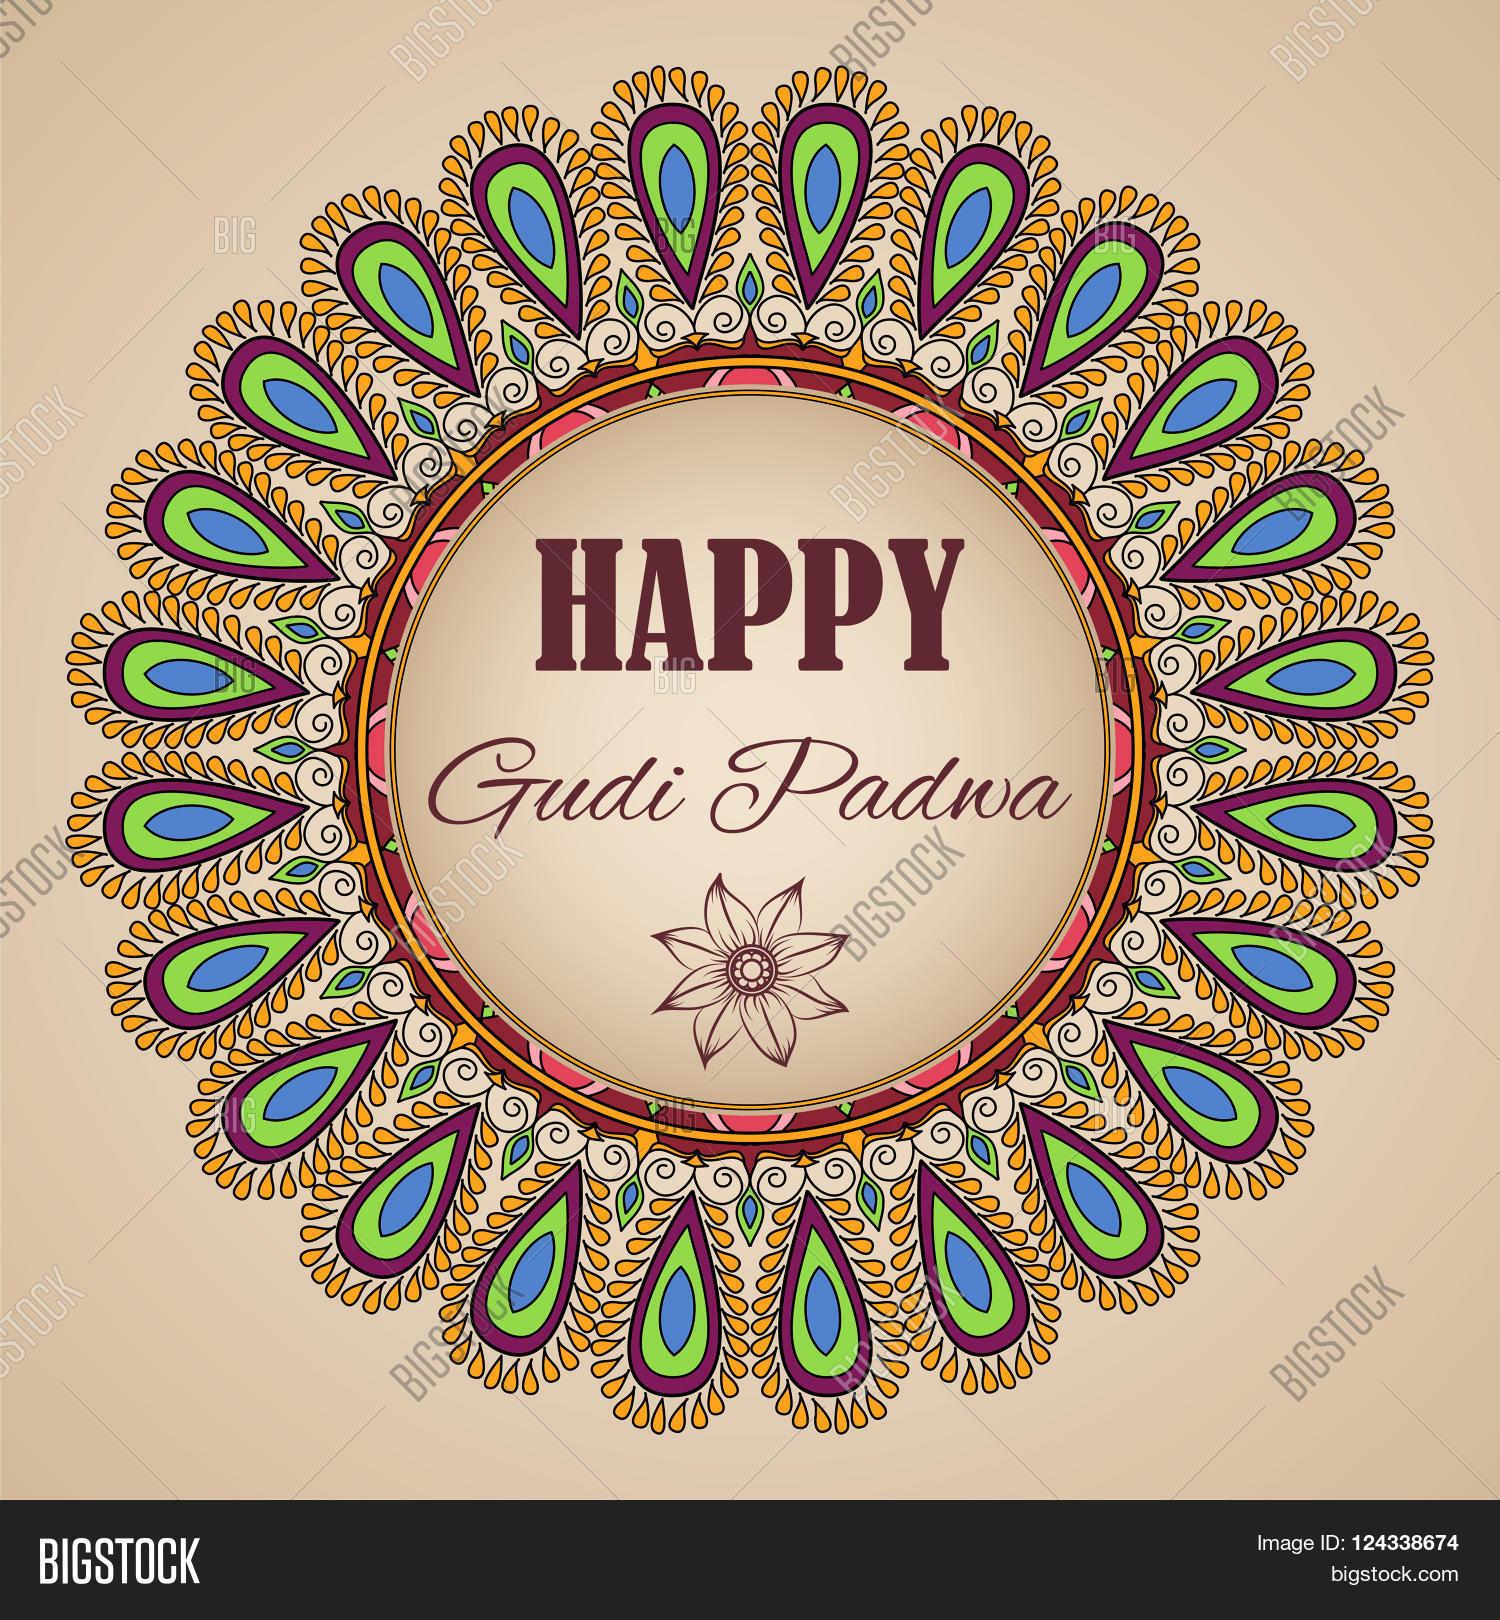 Happy Gudi Padwa Image Photo Free Trial Bigstock